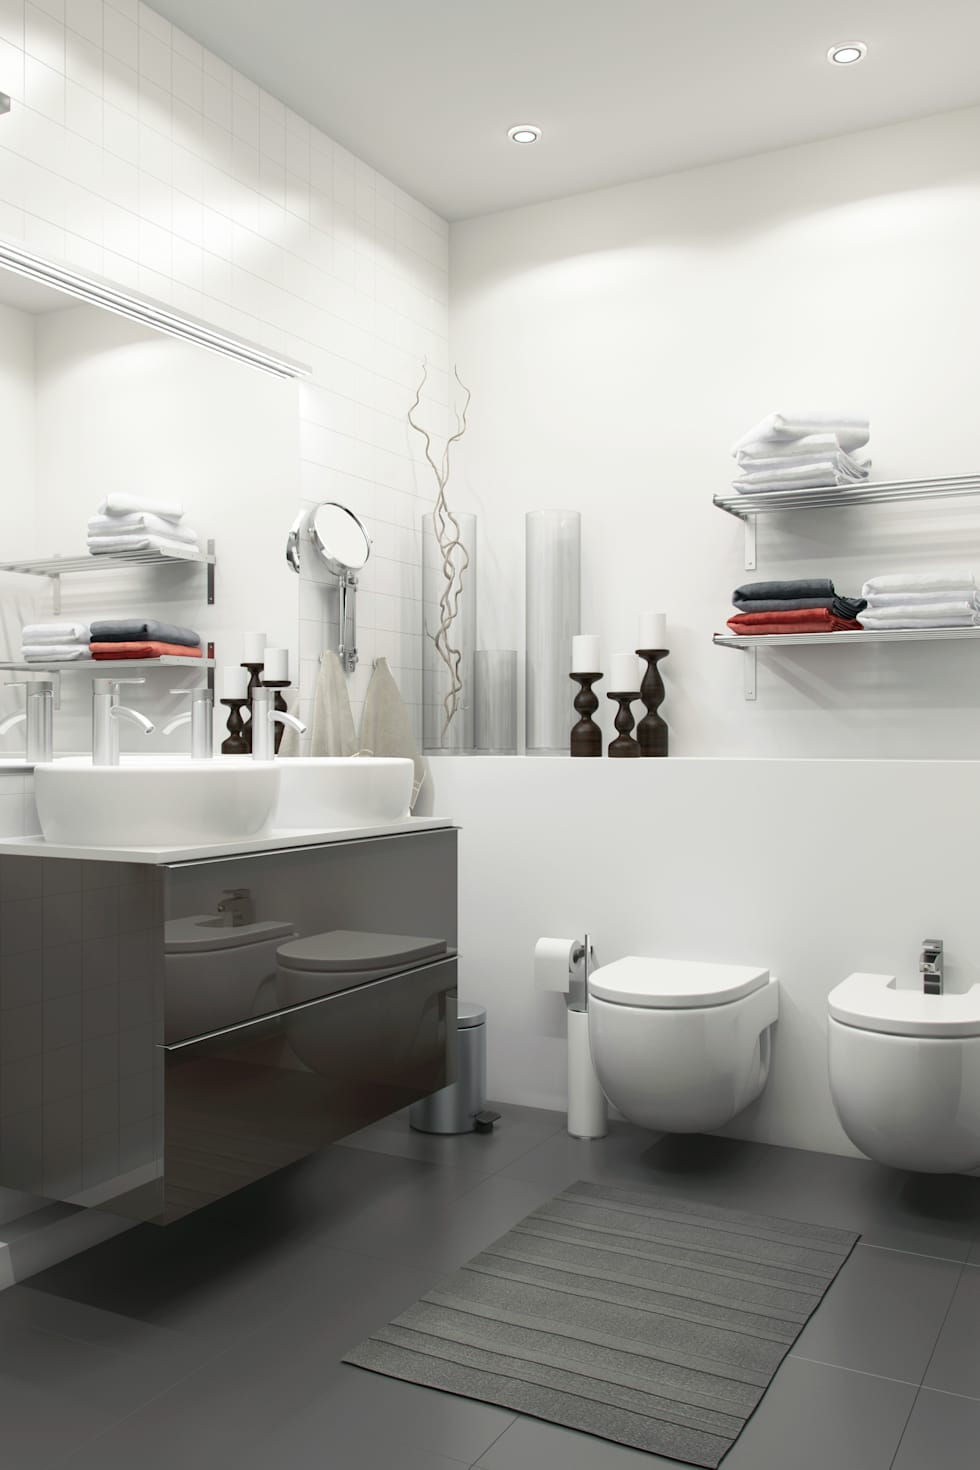 Fotos de decoraci n y dise o de interiores homify for Foto bagni moderni arredati